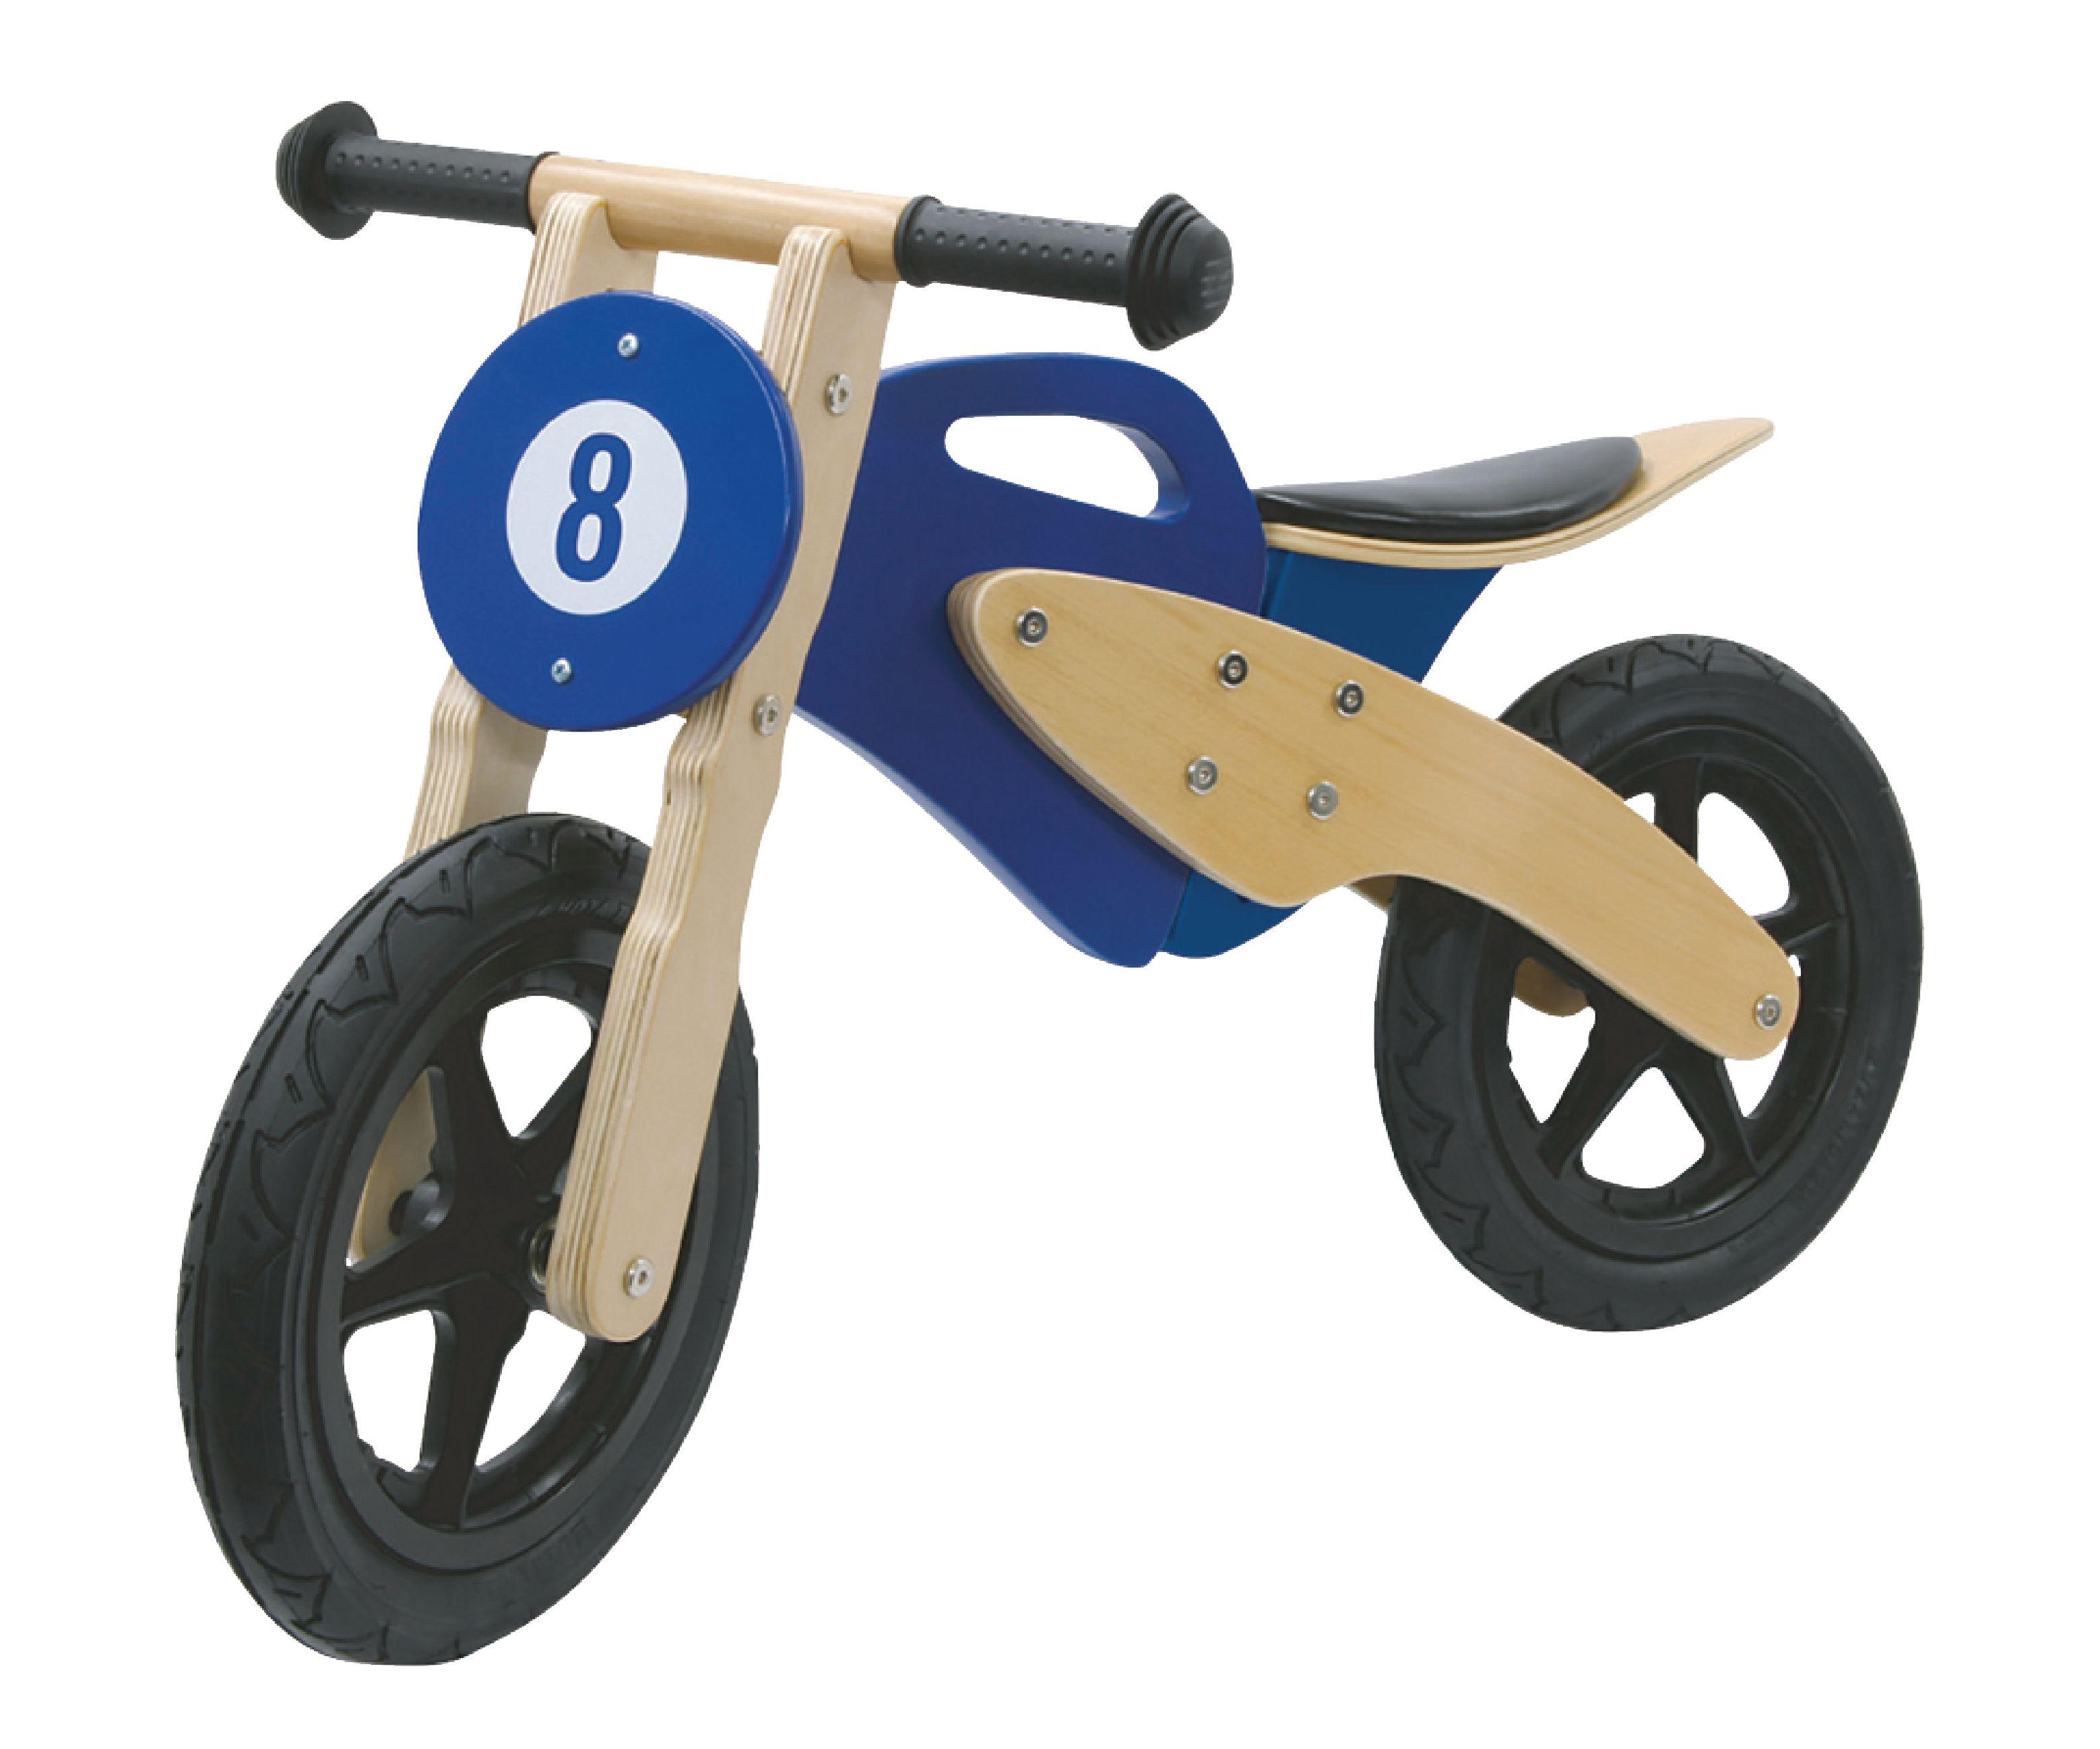 Dětské odrážedlo modrá motorka Jamara JAM-460232